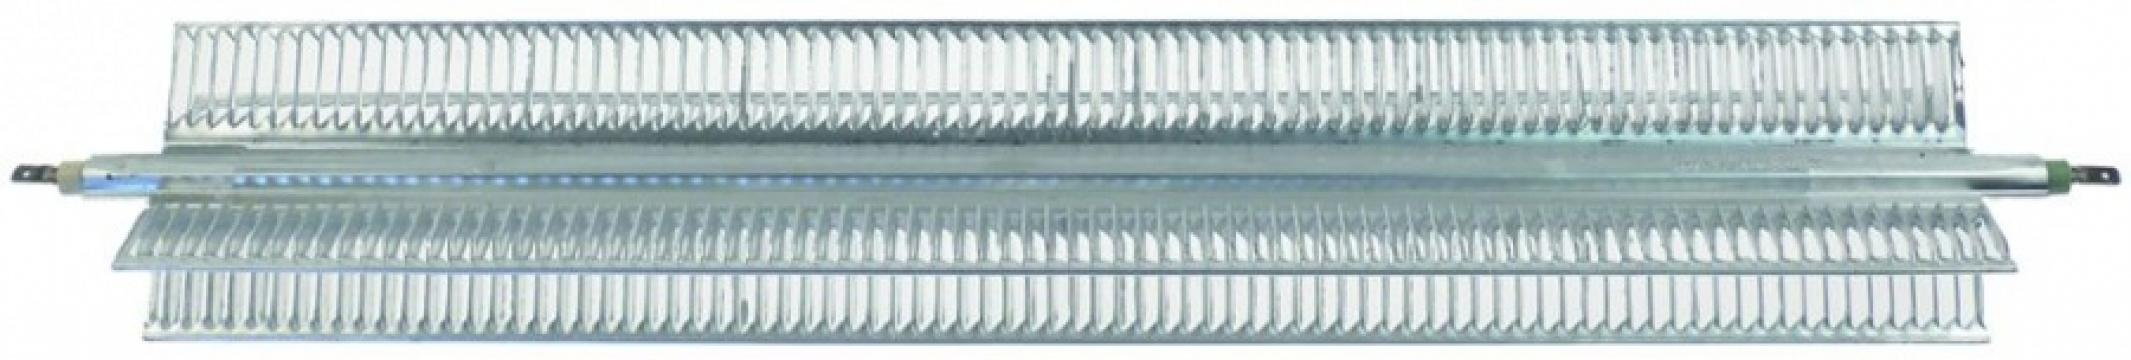 Rezistenta uscator Grandimpianti, 2000W, 230V, L=500mm